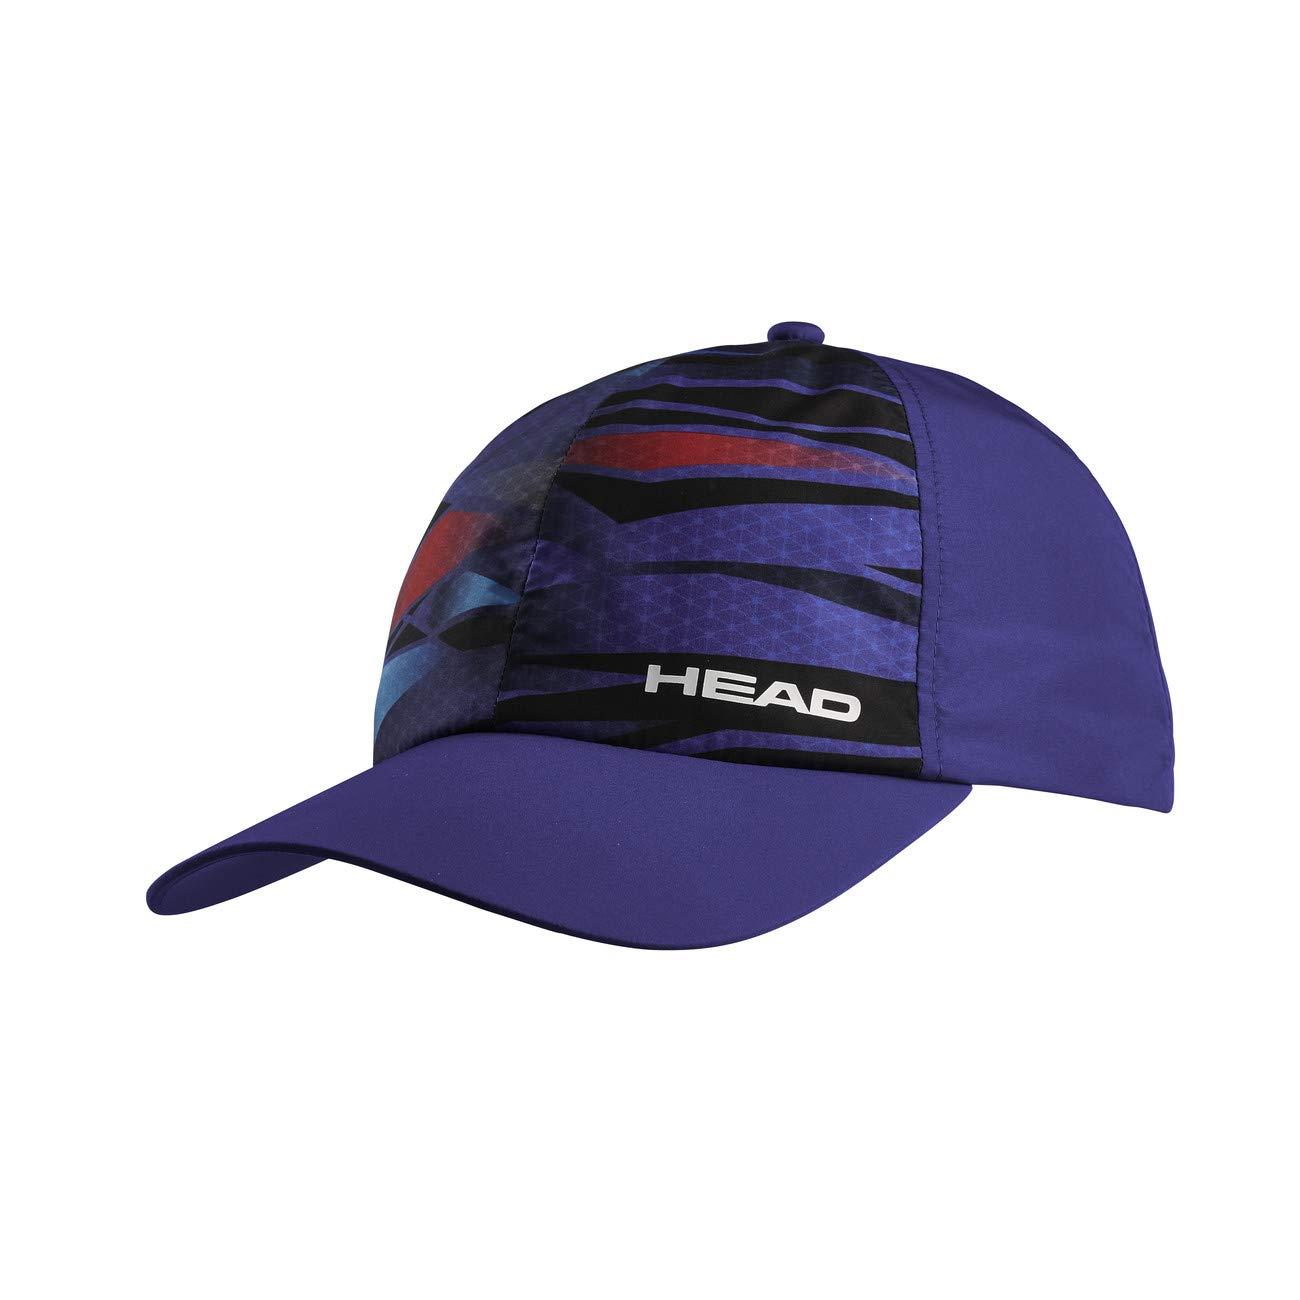 Head Light Function Cap Gorra de Tenis, Azul Marino, Talla única ...